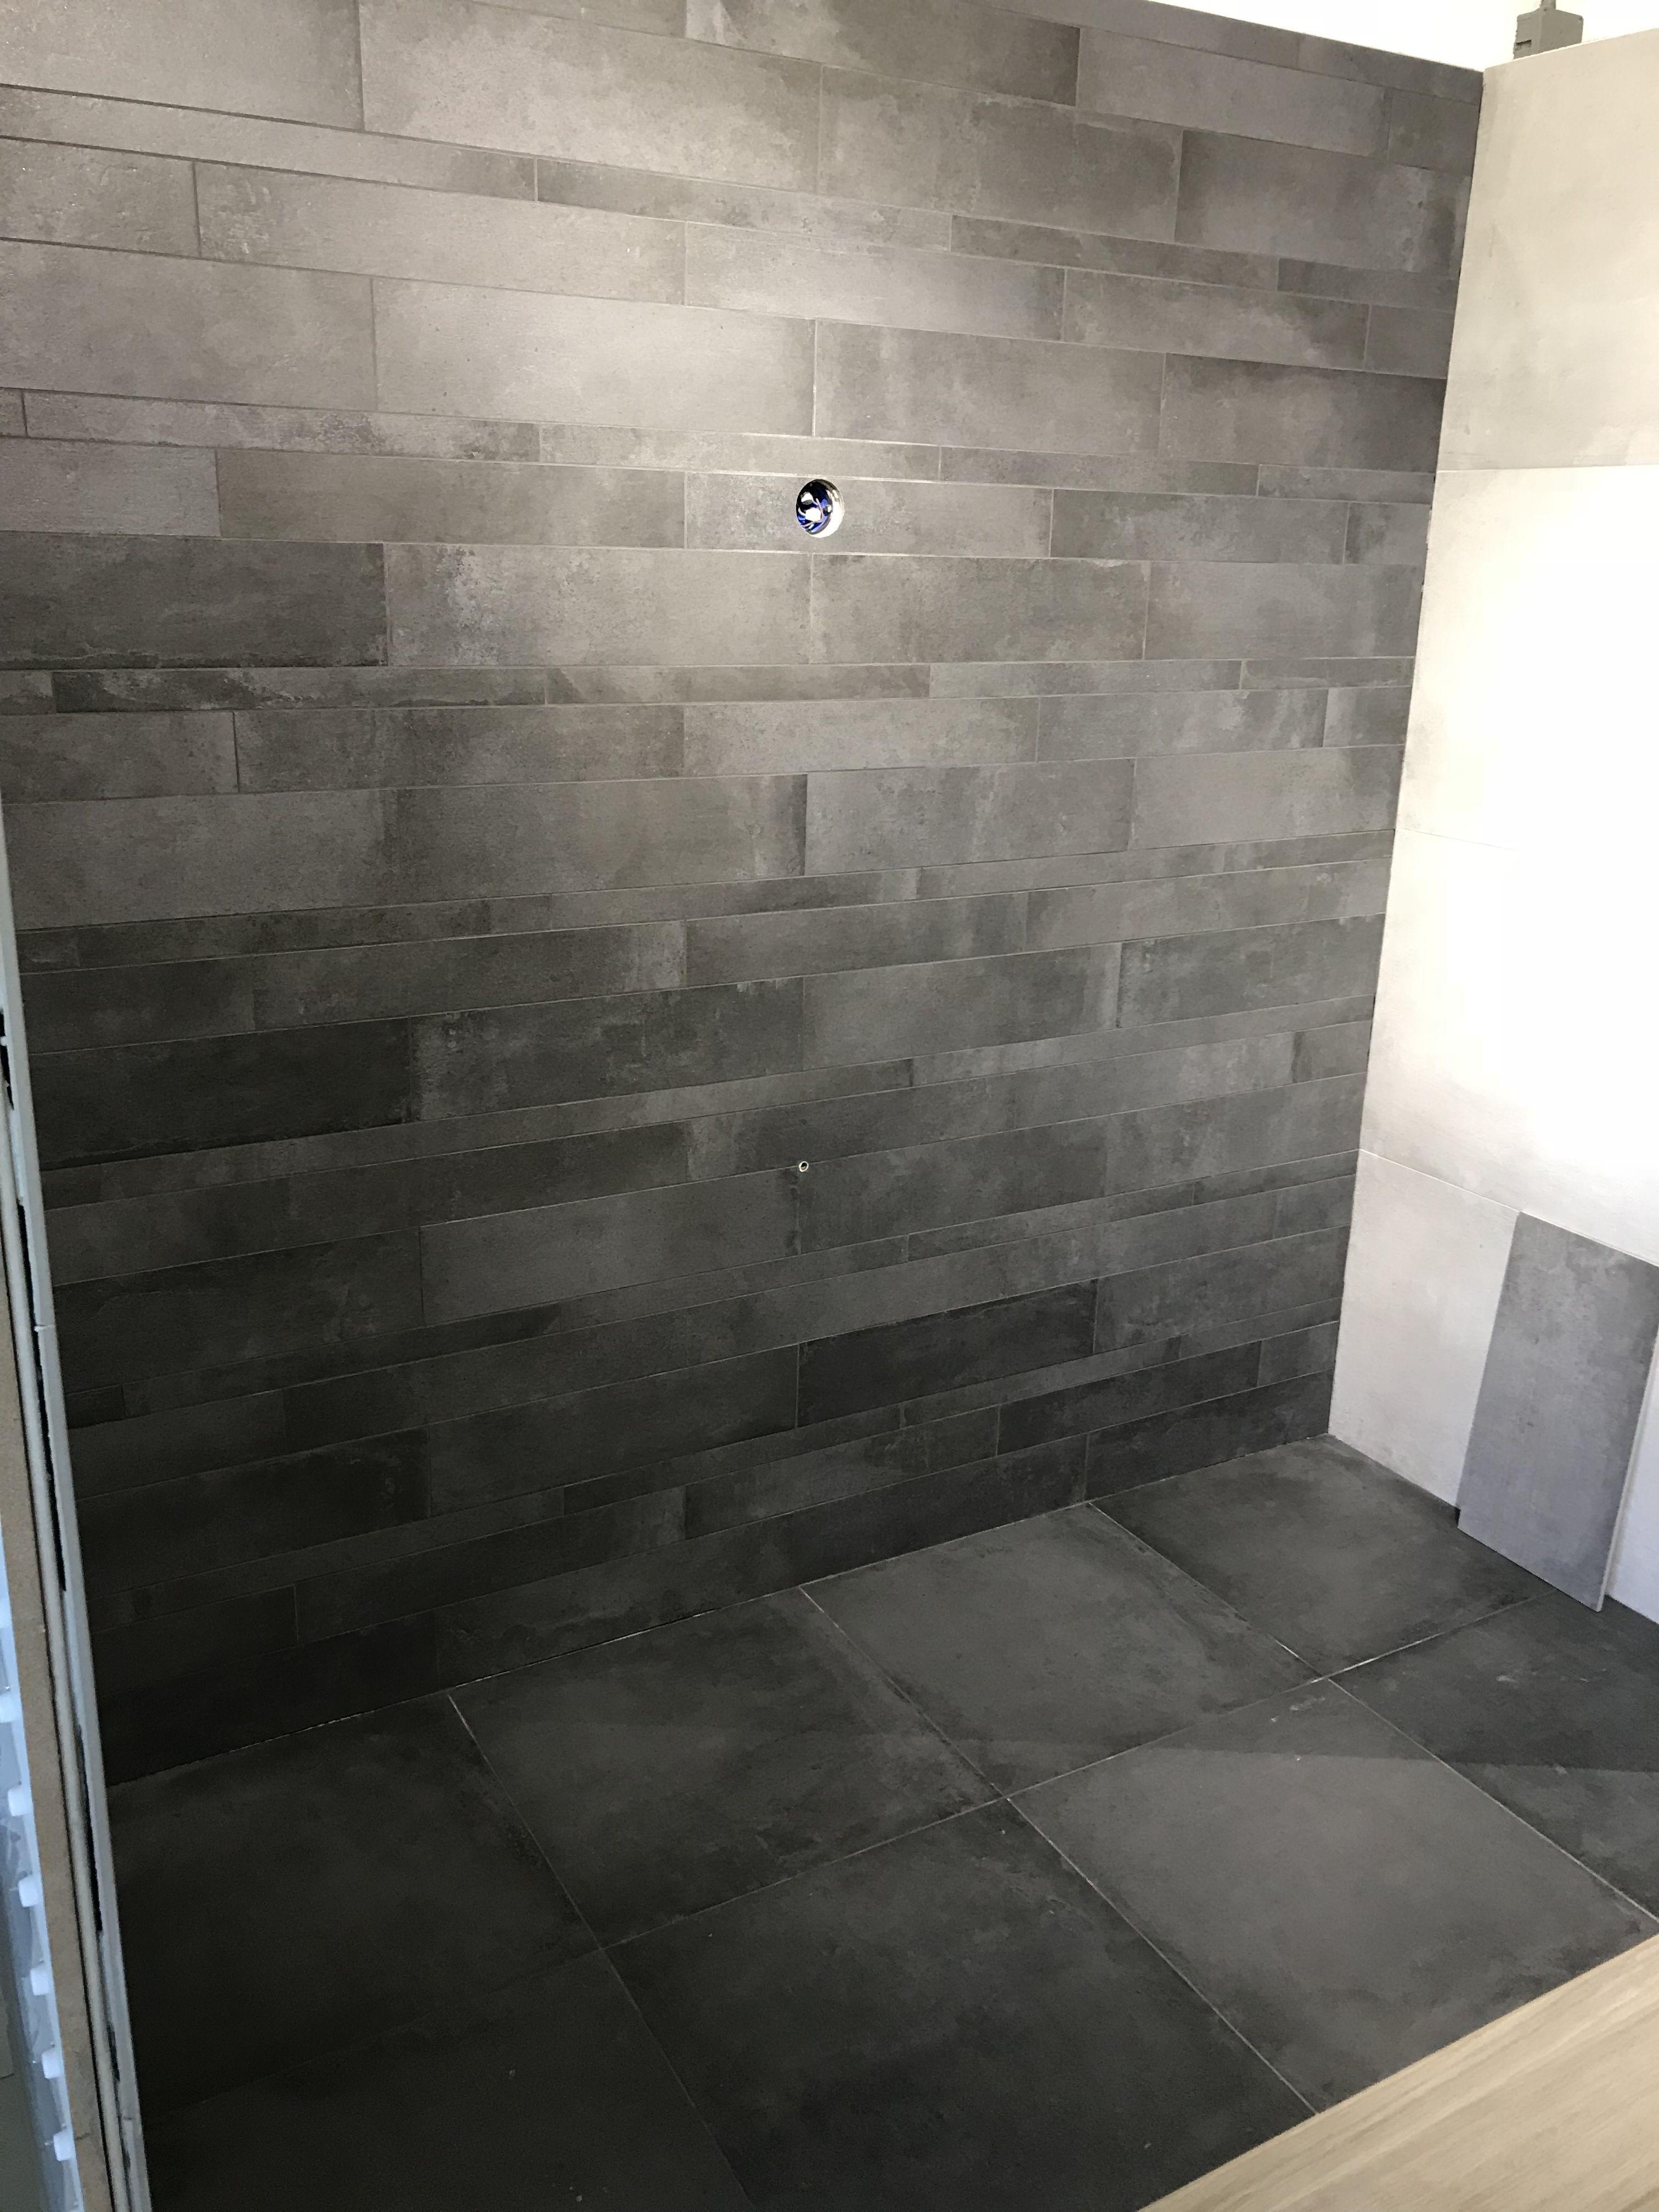 Tegelstroken antraciet cercom | Badkamer tegels | Pinterest